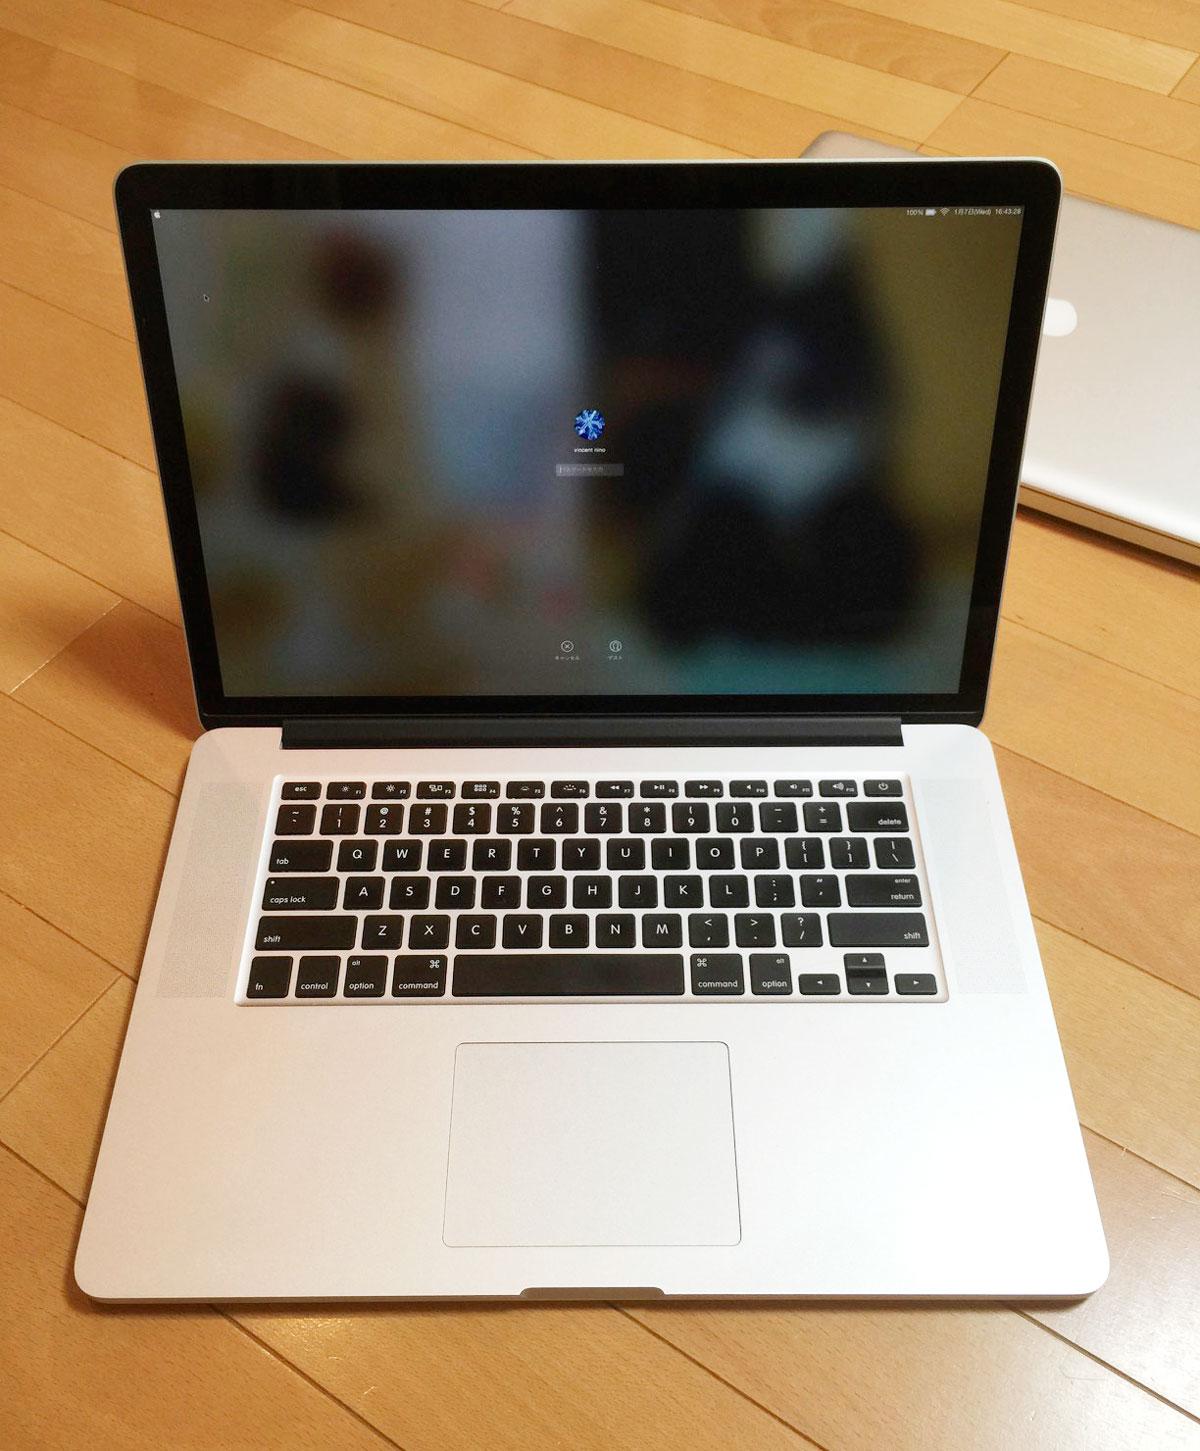 MacBook Pro Retinaディスプレイモデル 15インチ